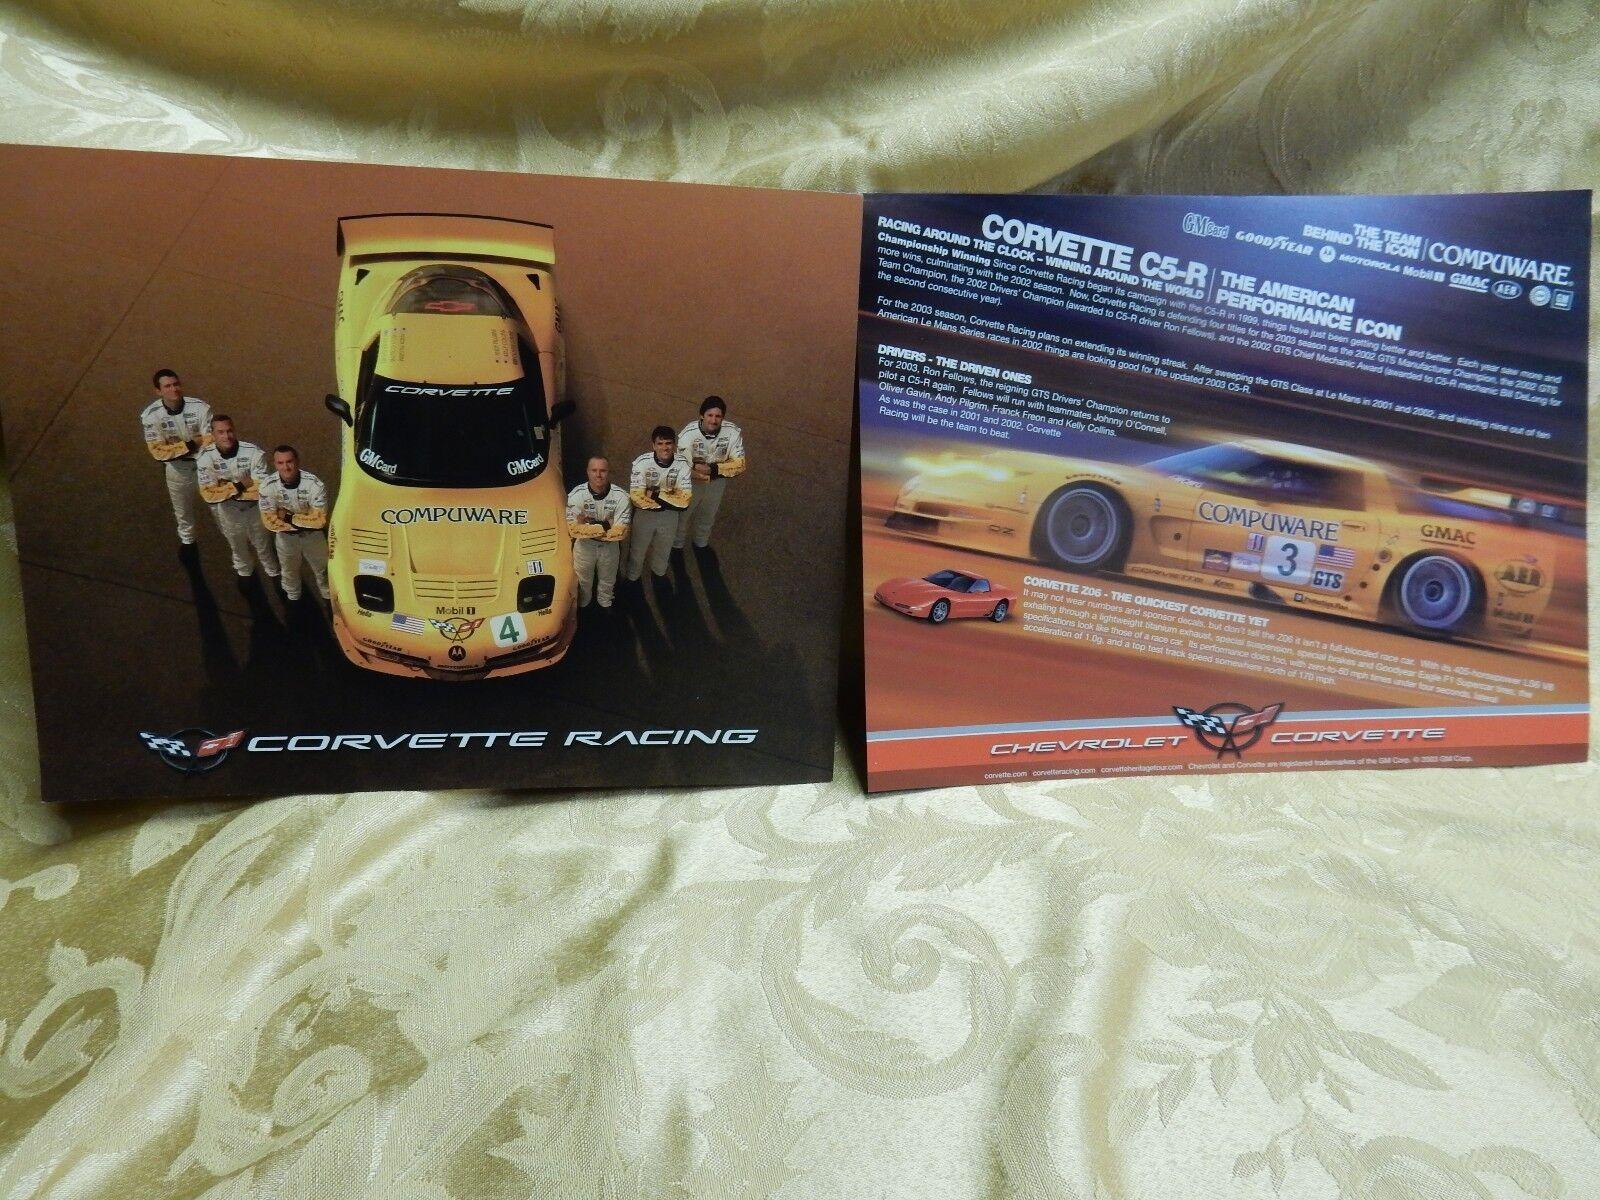 "26/"" x 18/"" brand new Corvette Racing Poster C5 Z06 C5-R Race Car Cutaway"